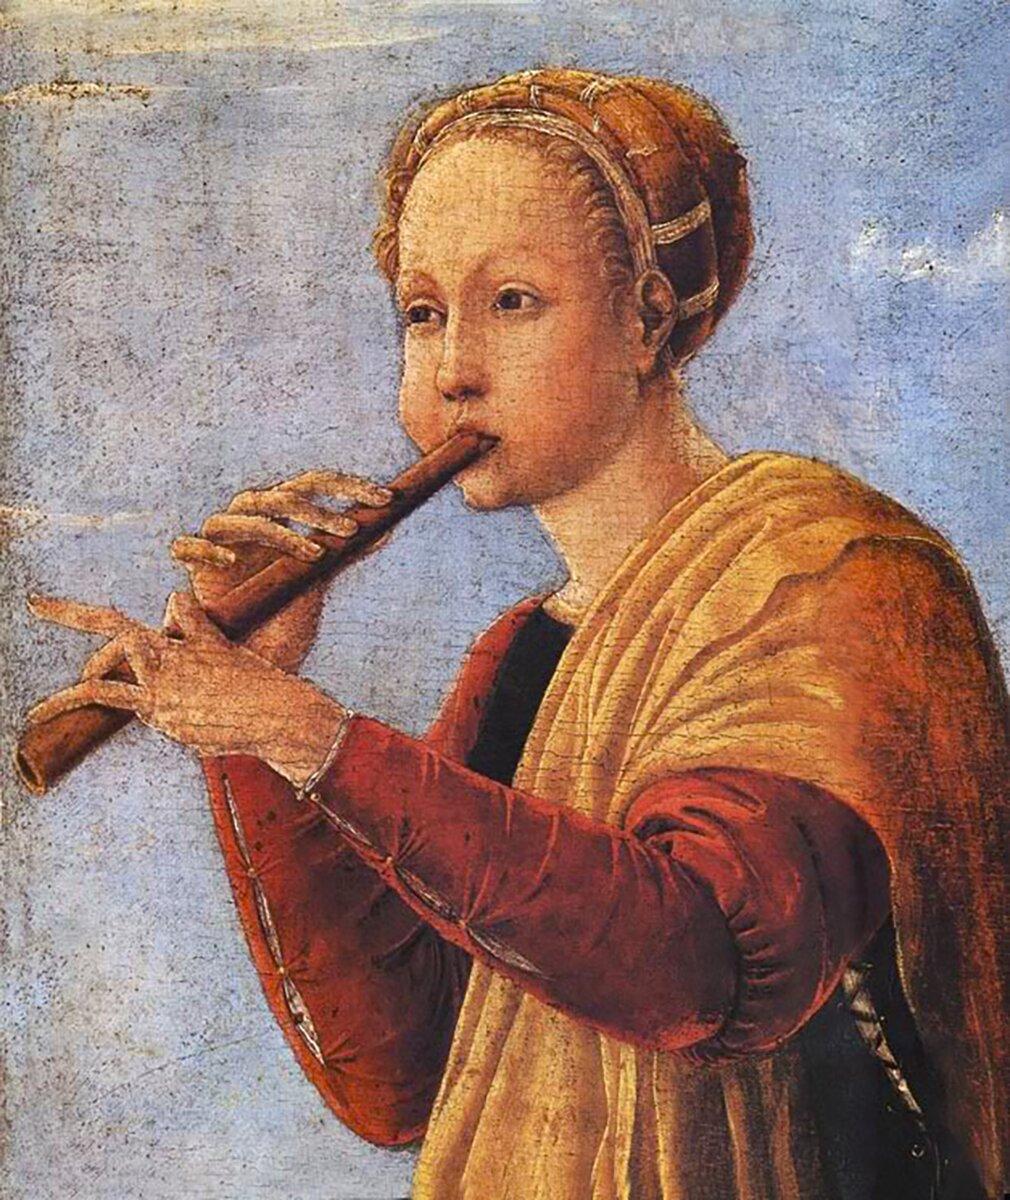 Франческо дель Косса. Муза Эвтерпа. 1460 год